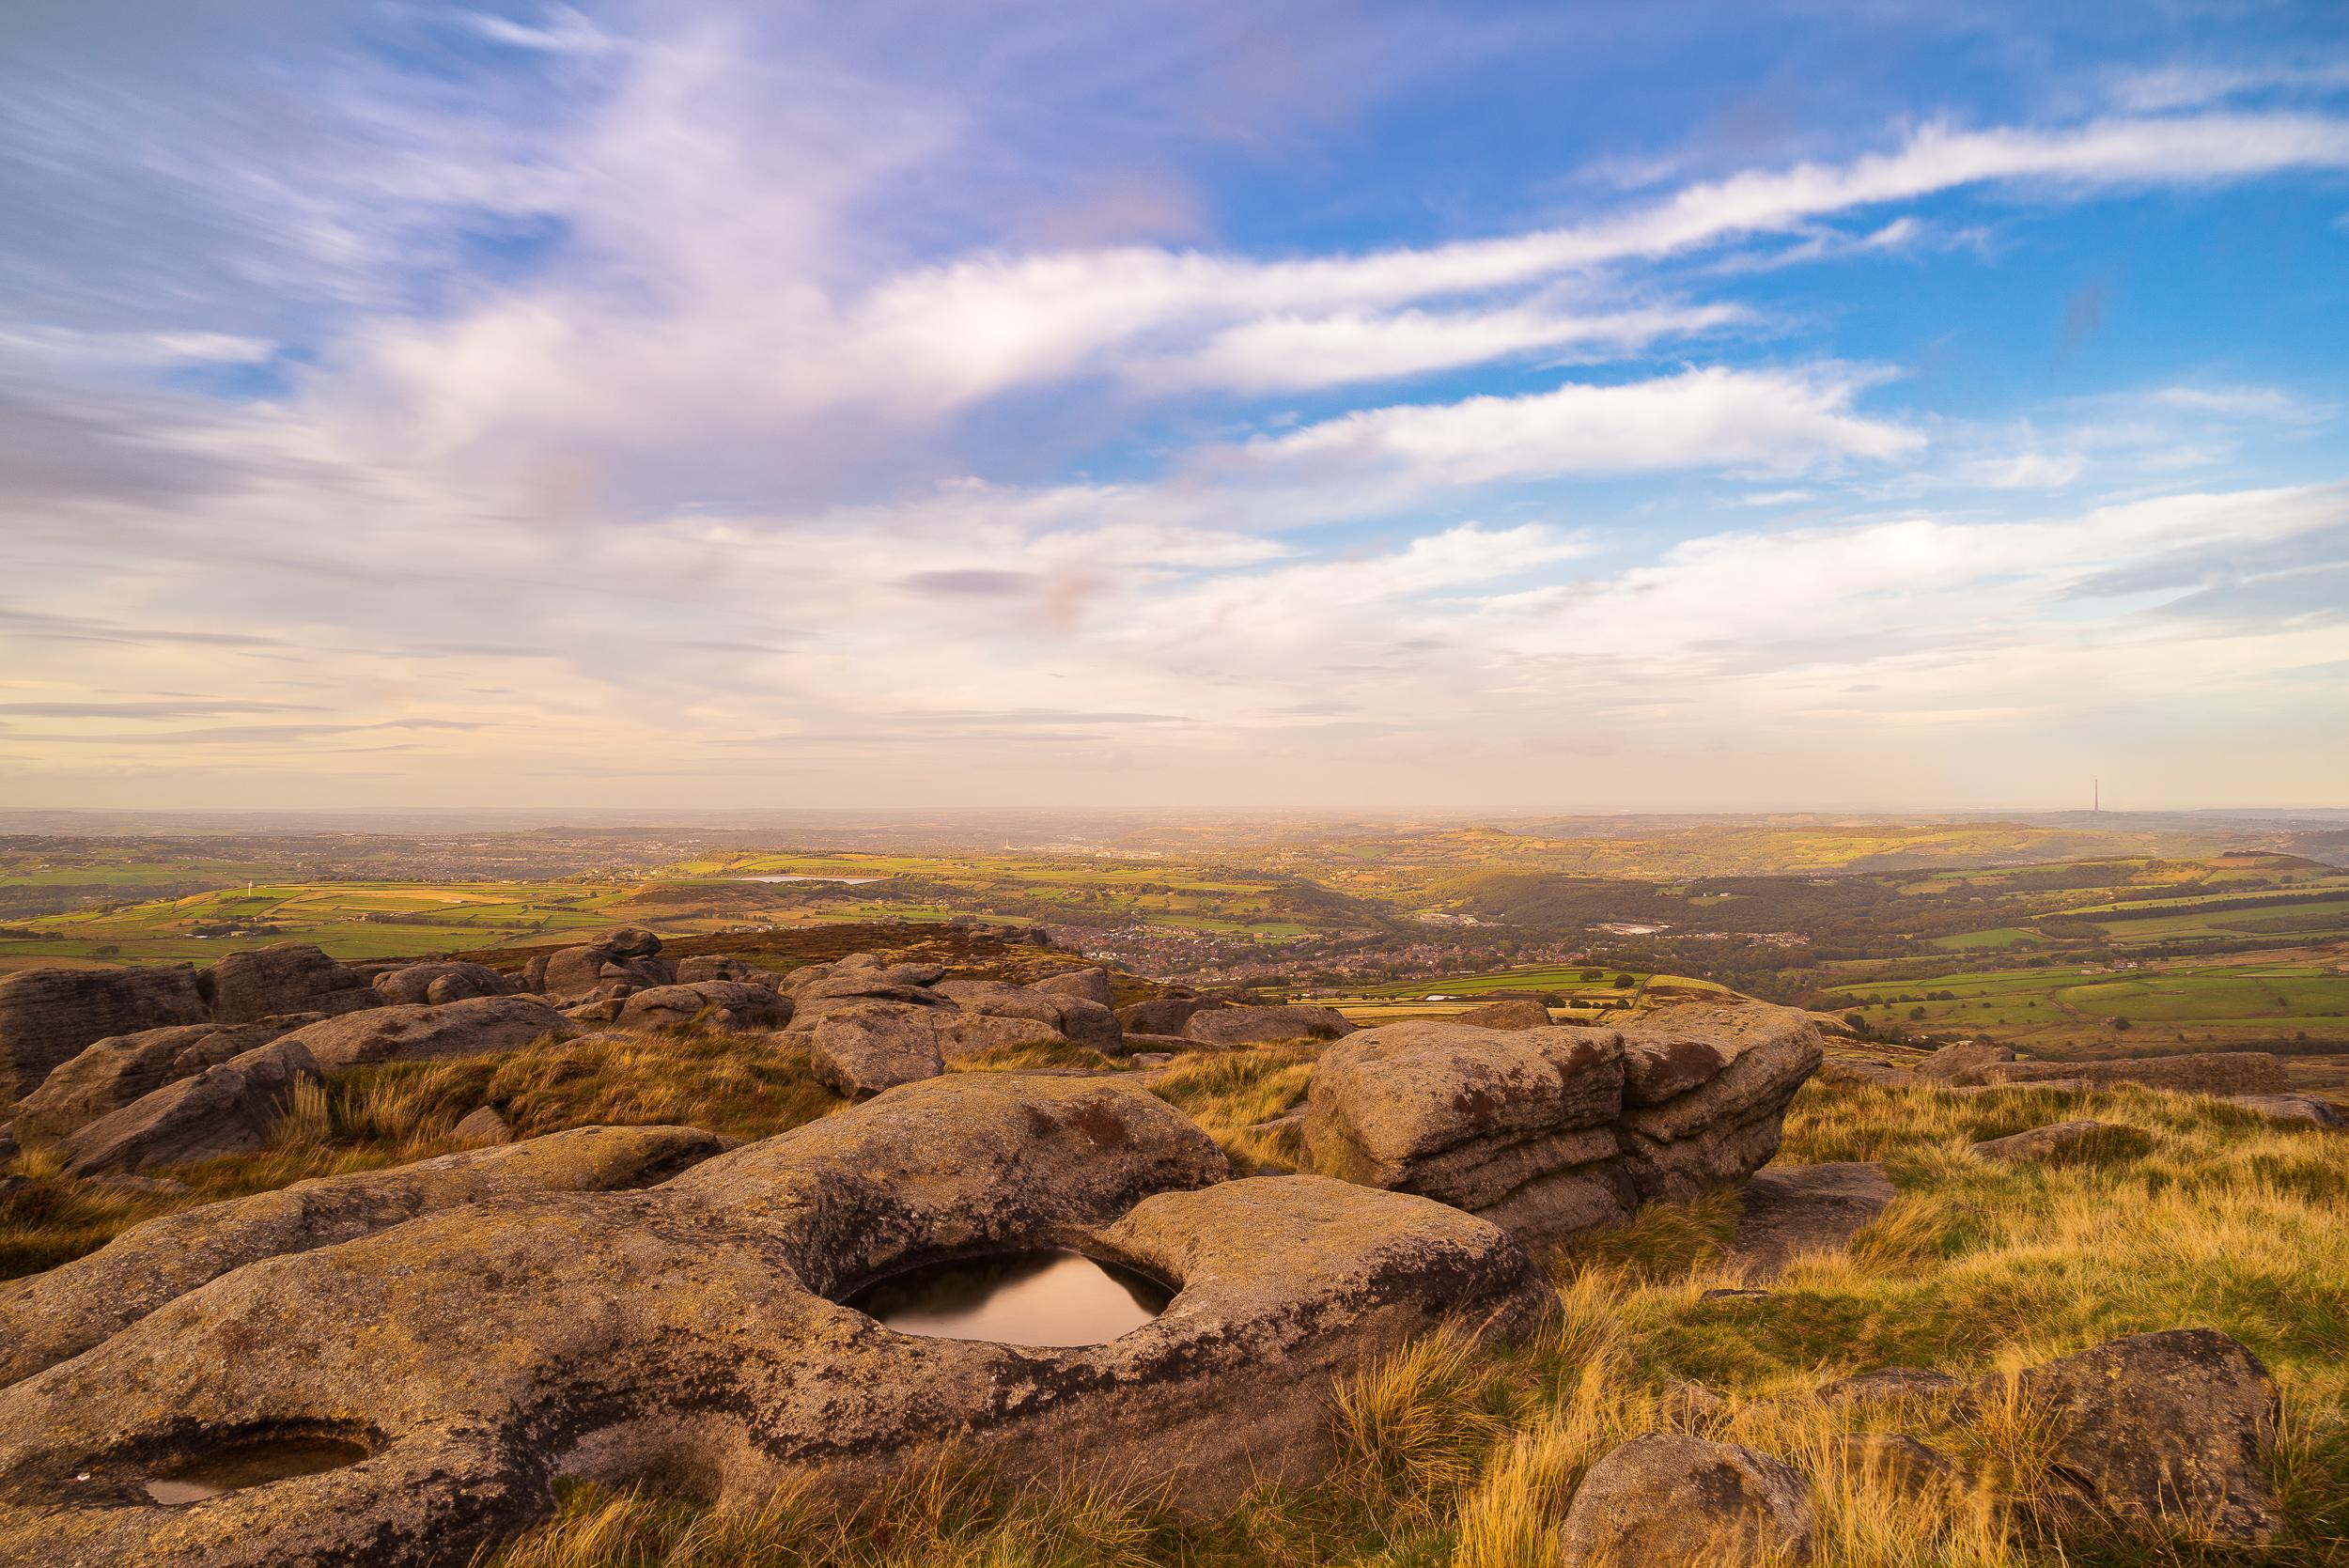 West Nab ~ Huddersfield - Sony A7r + 24/70mm f4ISO50 / 24mm / f11 / 13 secs